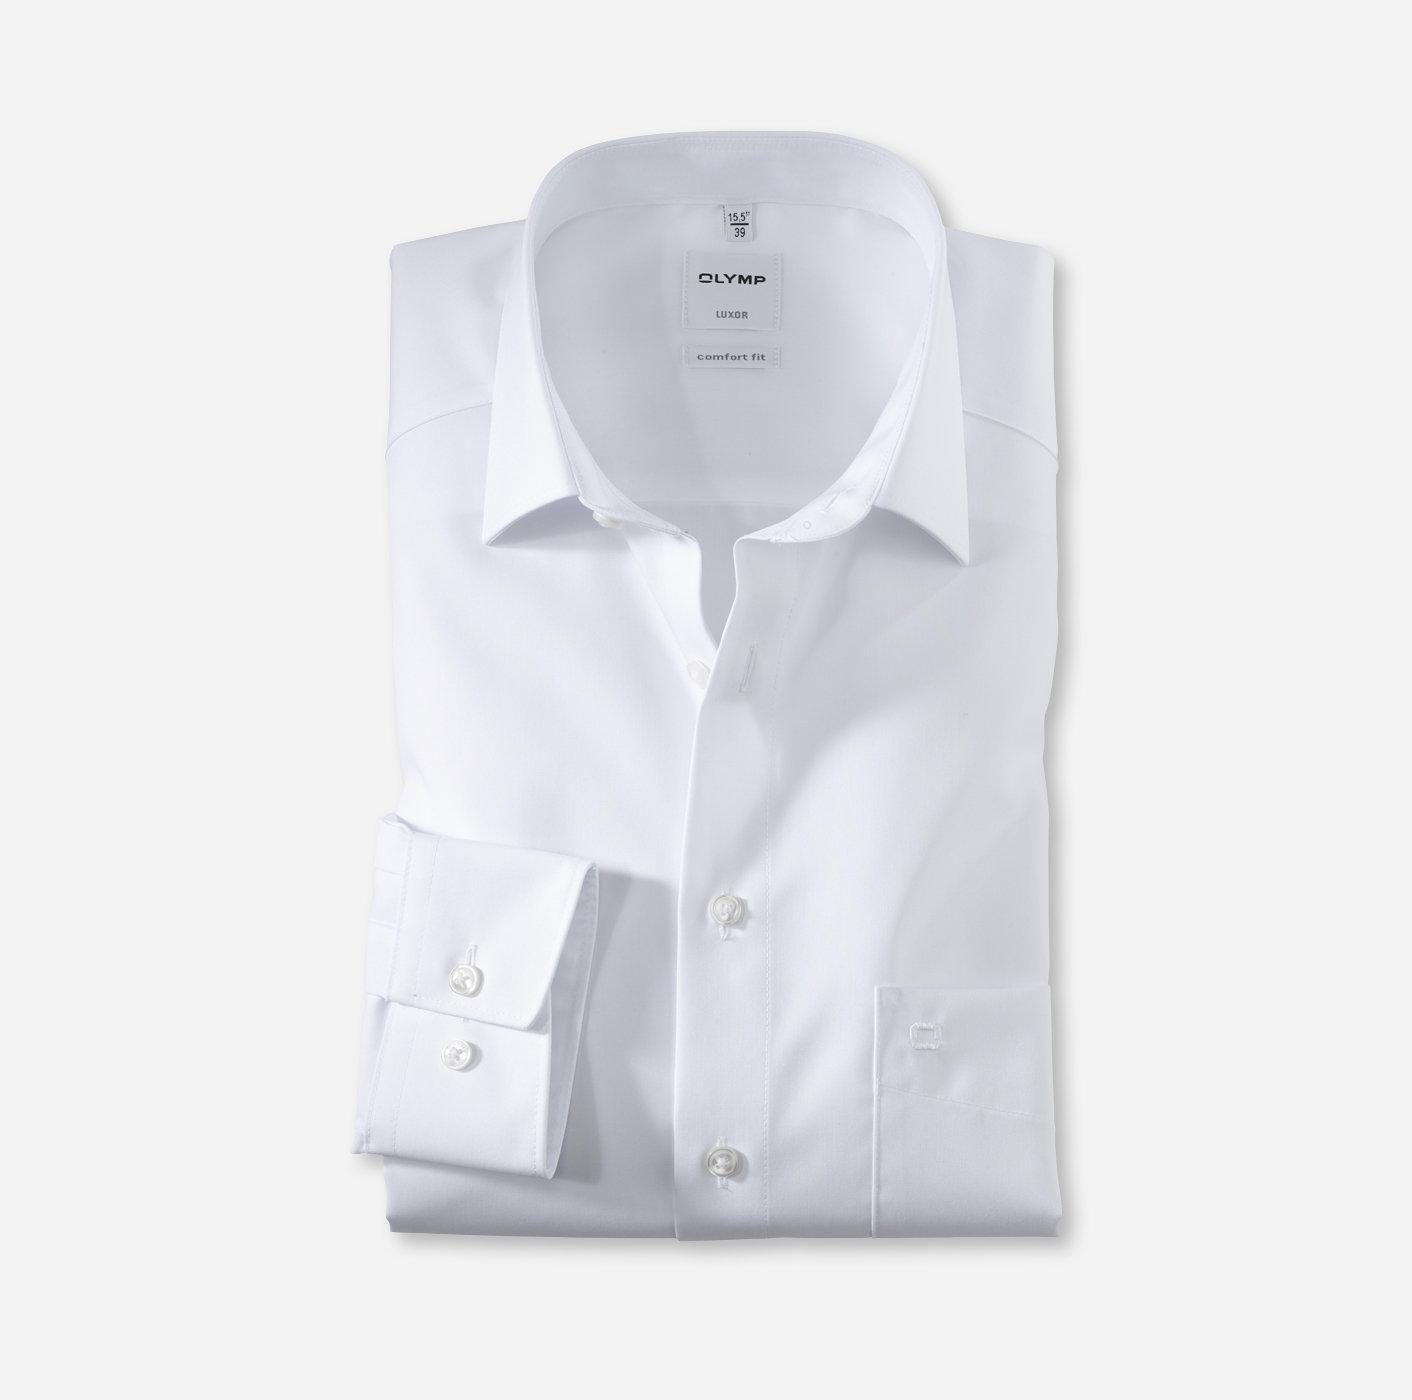 Oberhemd Luxor, 1/1 Arm, weiß, comfort fit, extra langer Arm